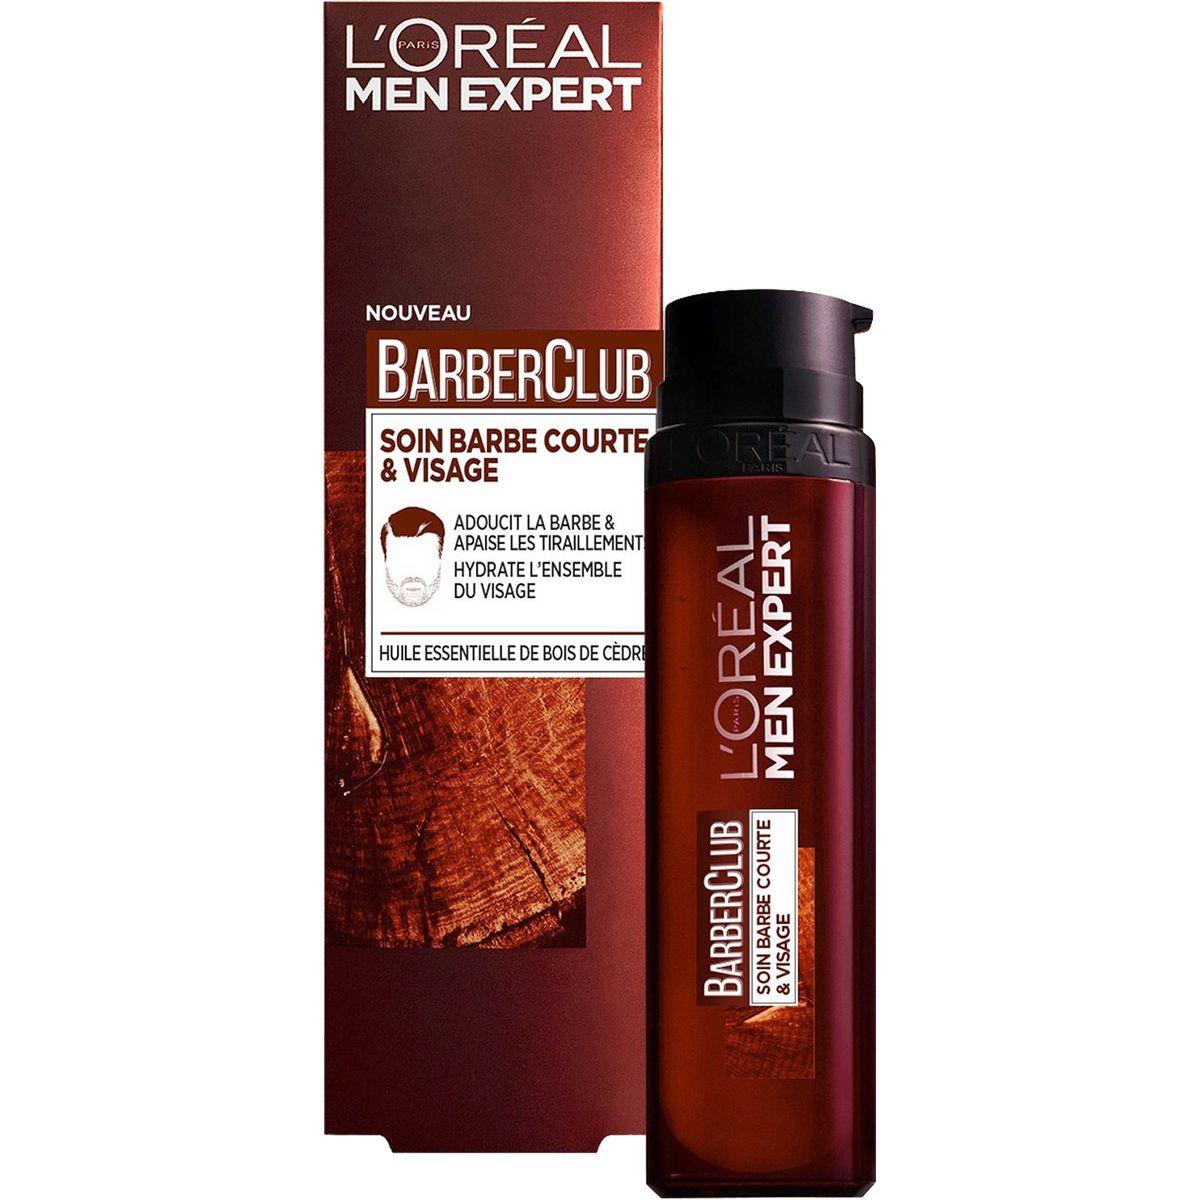 L'Oréal Barber Club soin barbe courte et visage 50ml